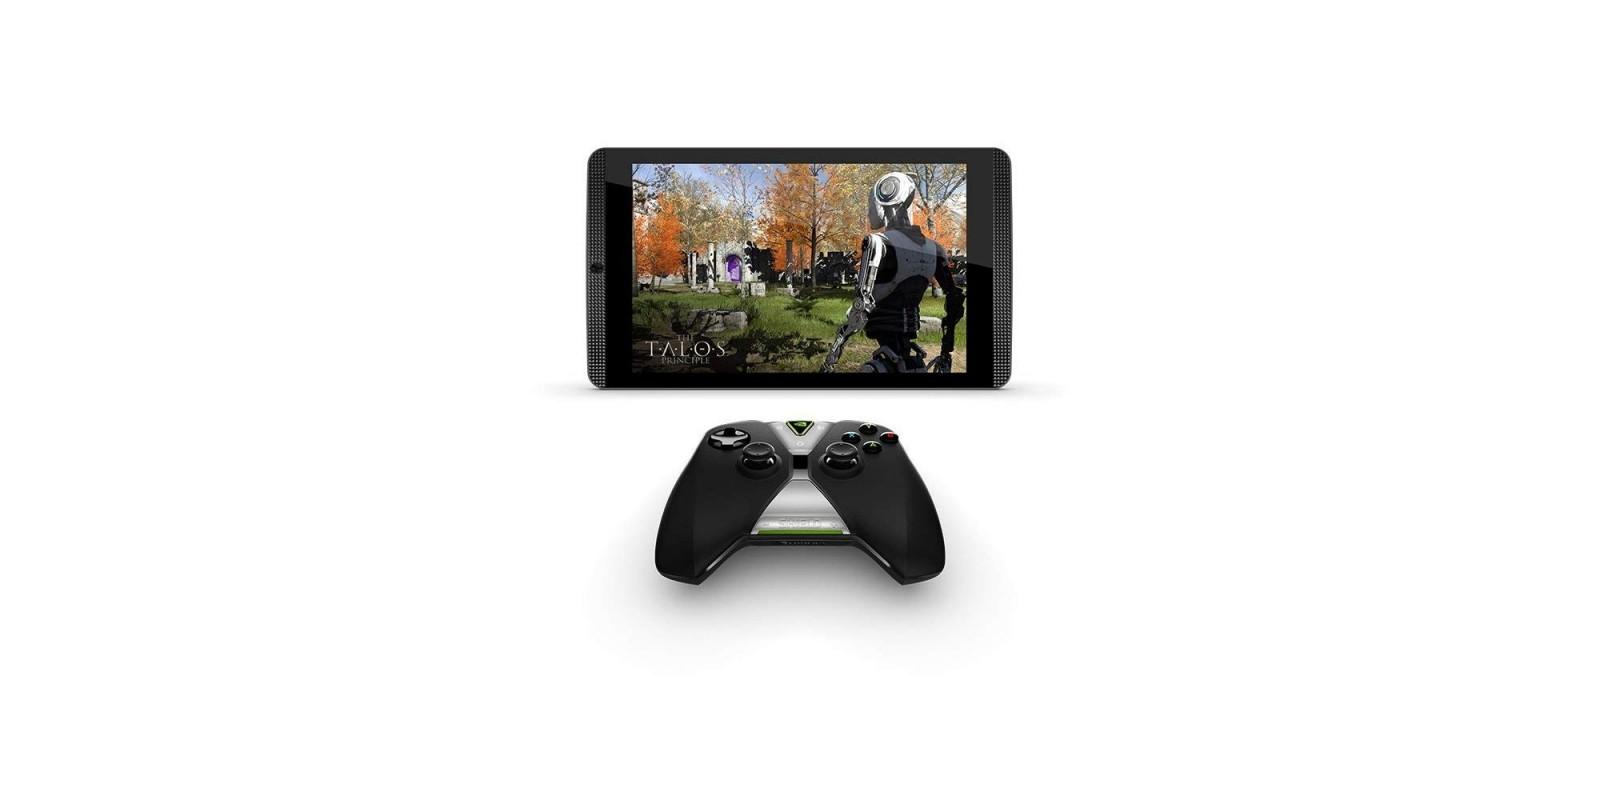 NVIDIA SHIELD K1 8-inch Tablet (Black) – Joystick